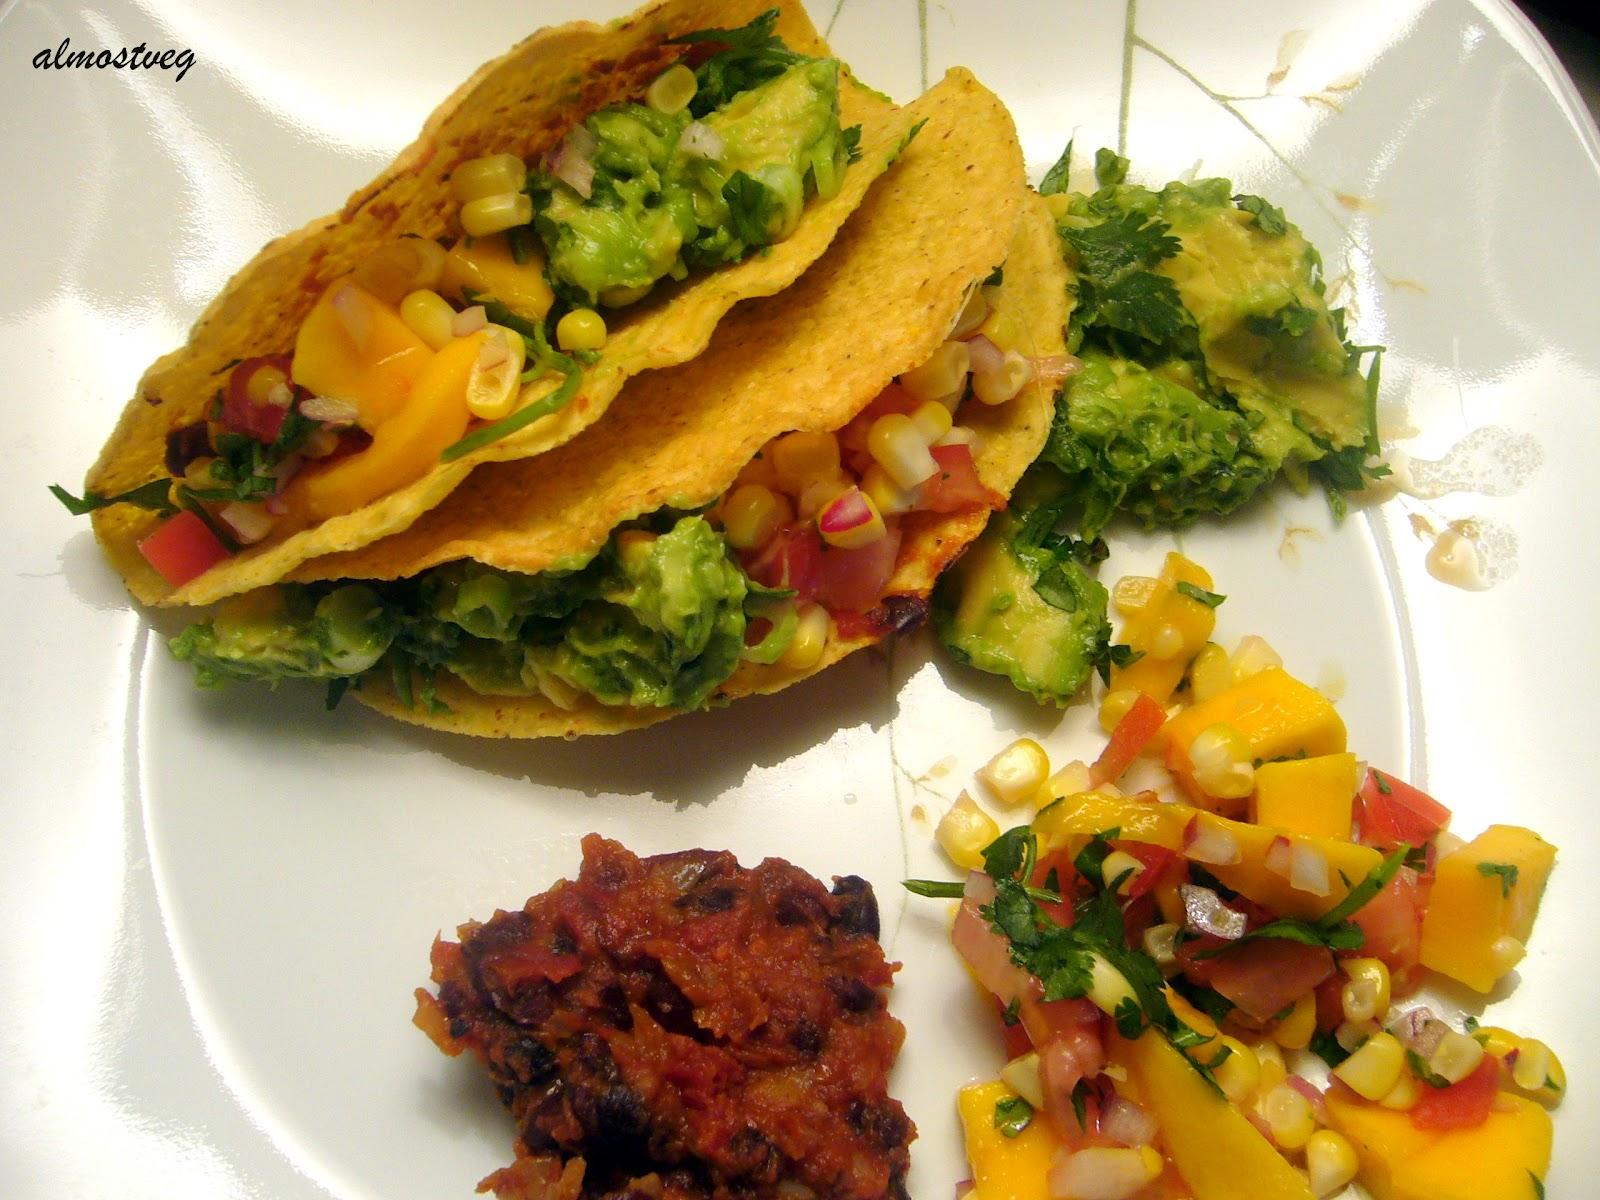 black bean tacos with mango salsa and guacamole one box of corn tacos ...